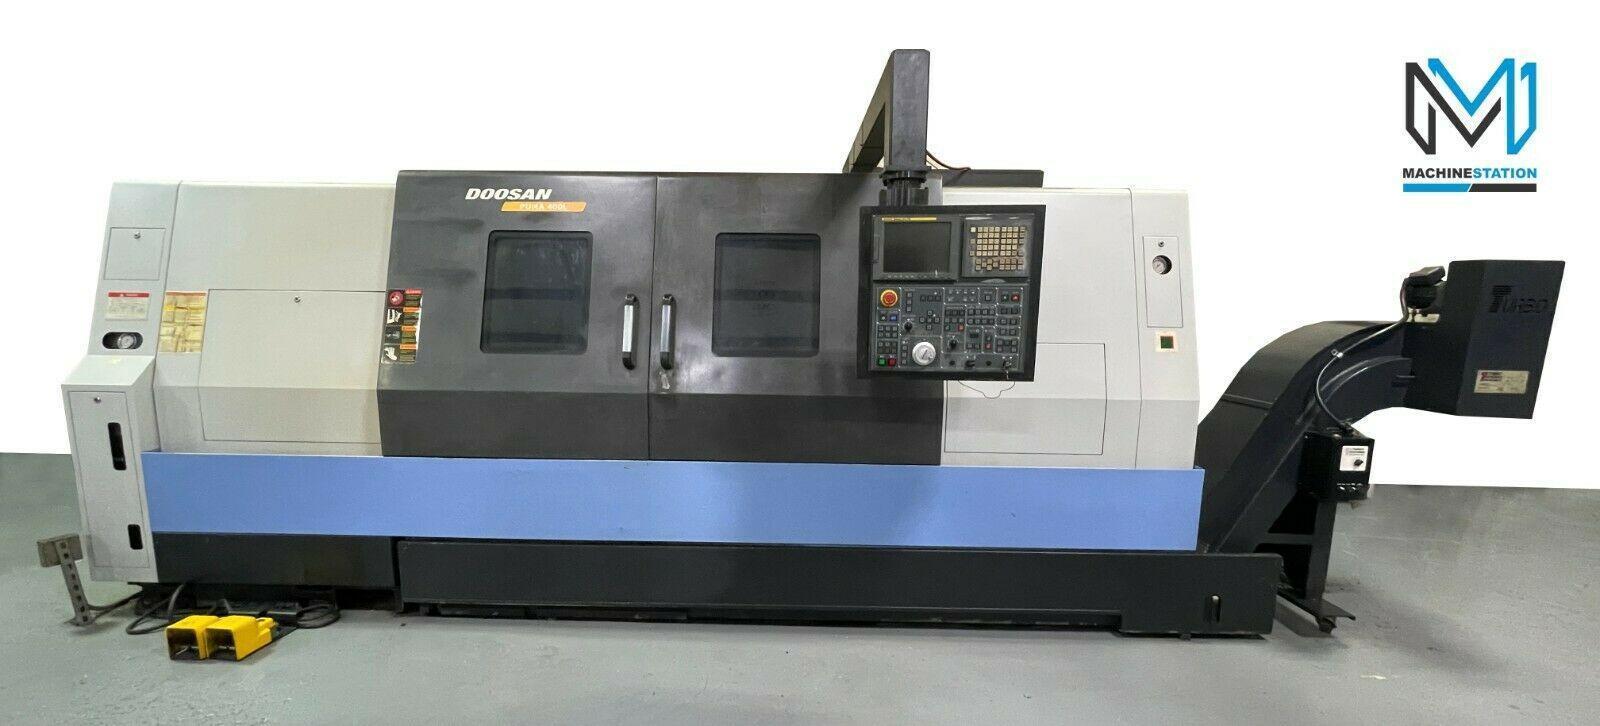 DOOSAN PUMA 400LB CNC TURNING CENTER